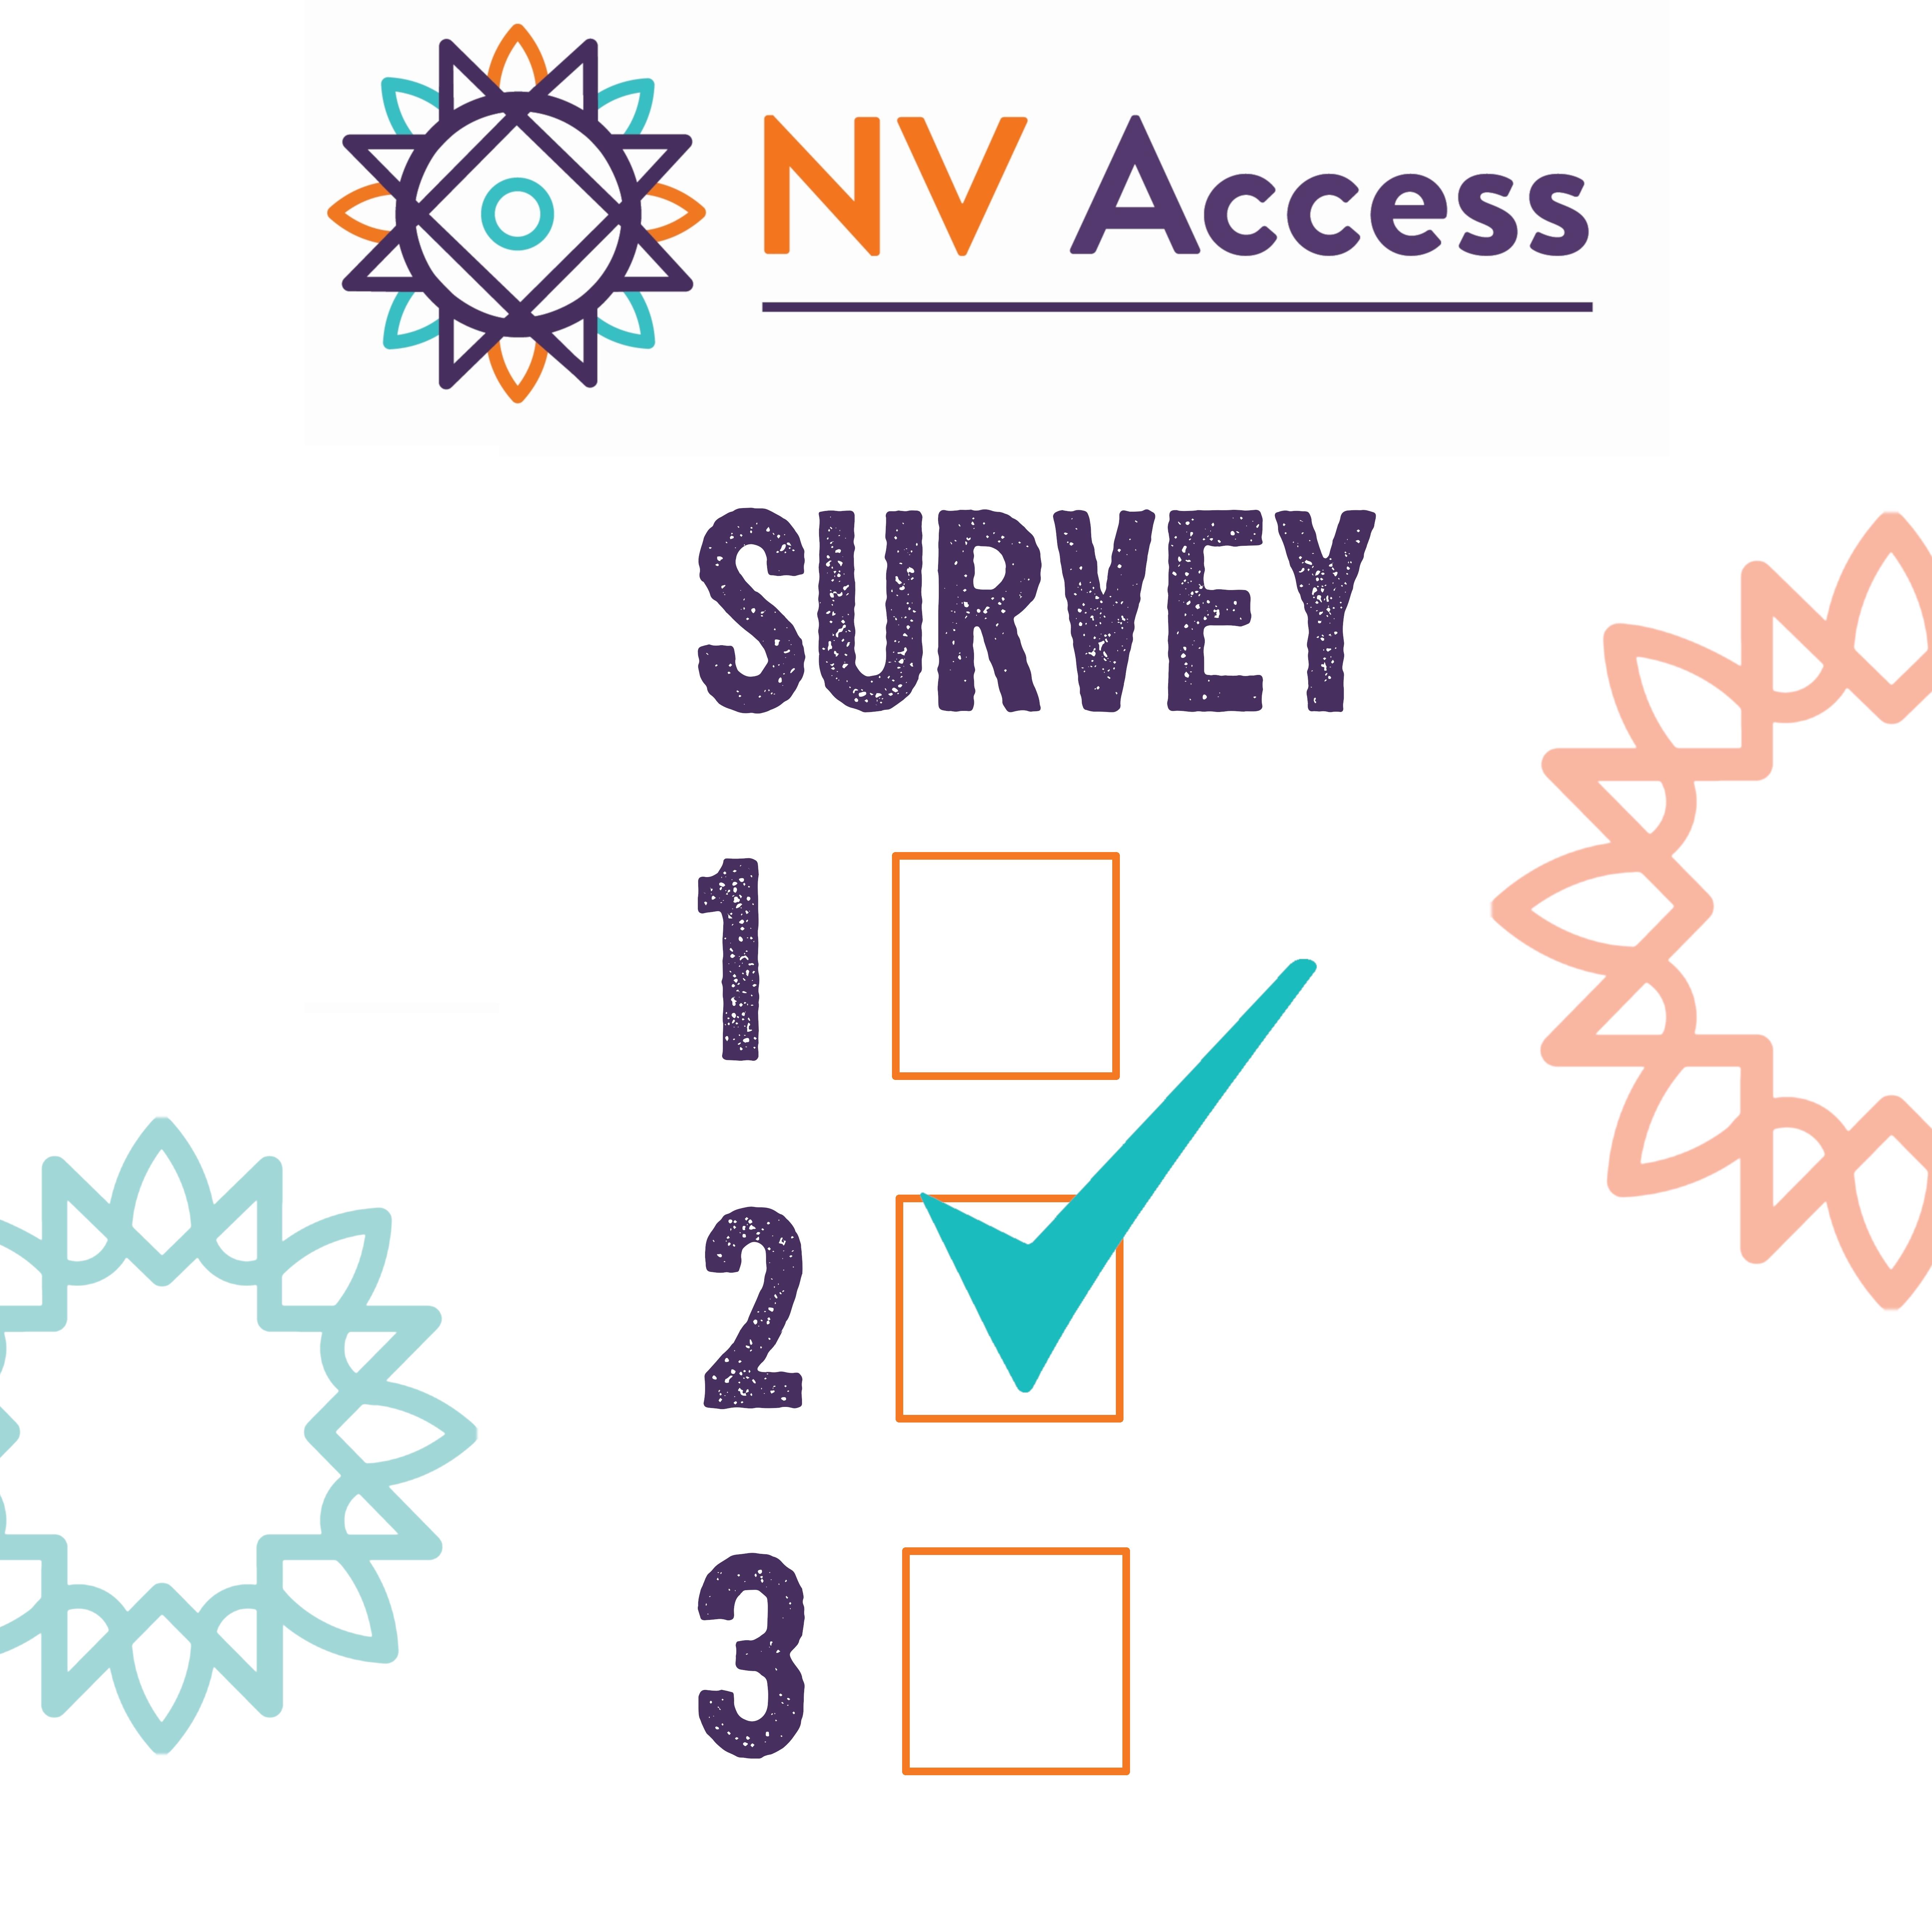 NV Access Survey mockup image